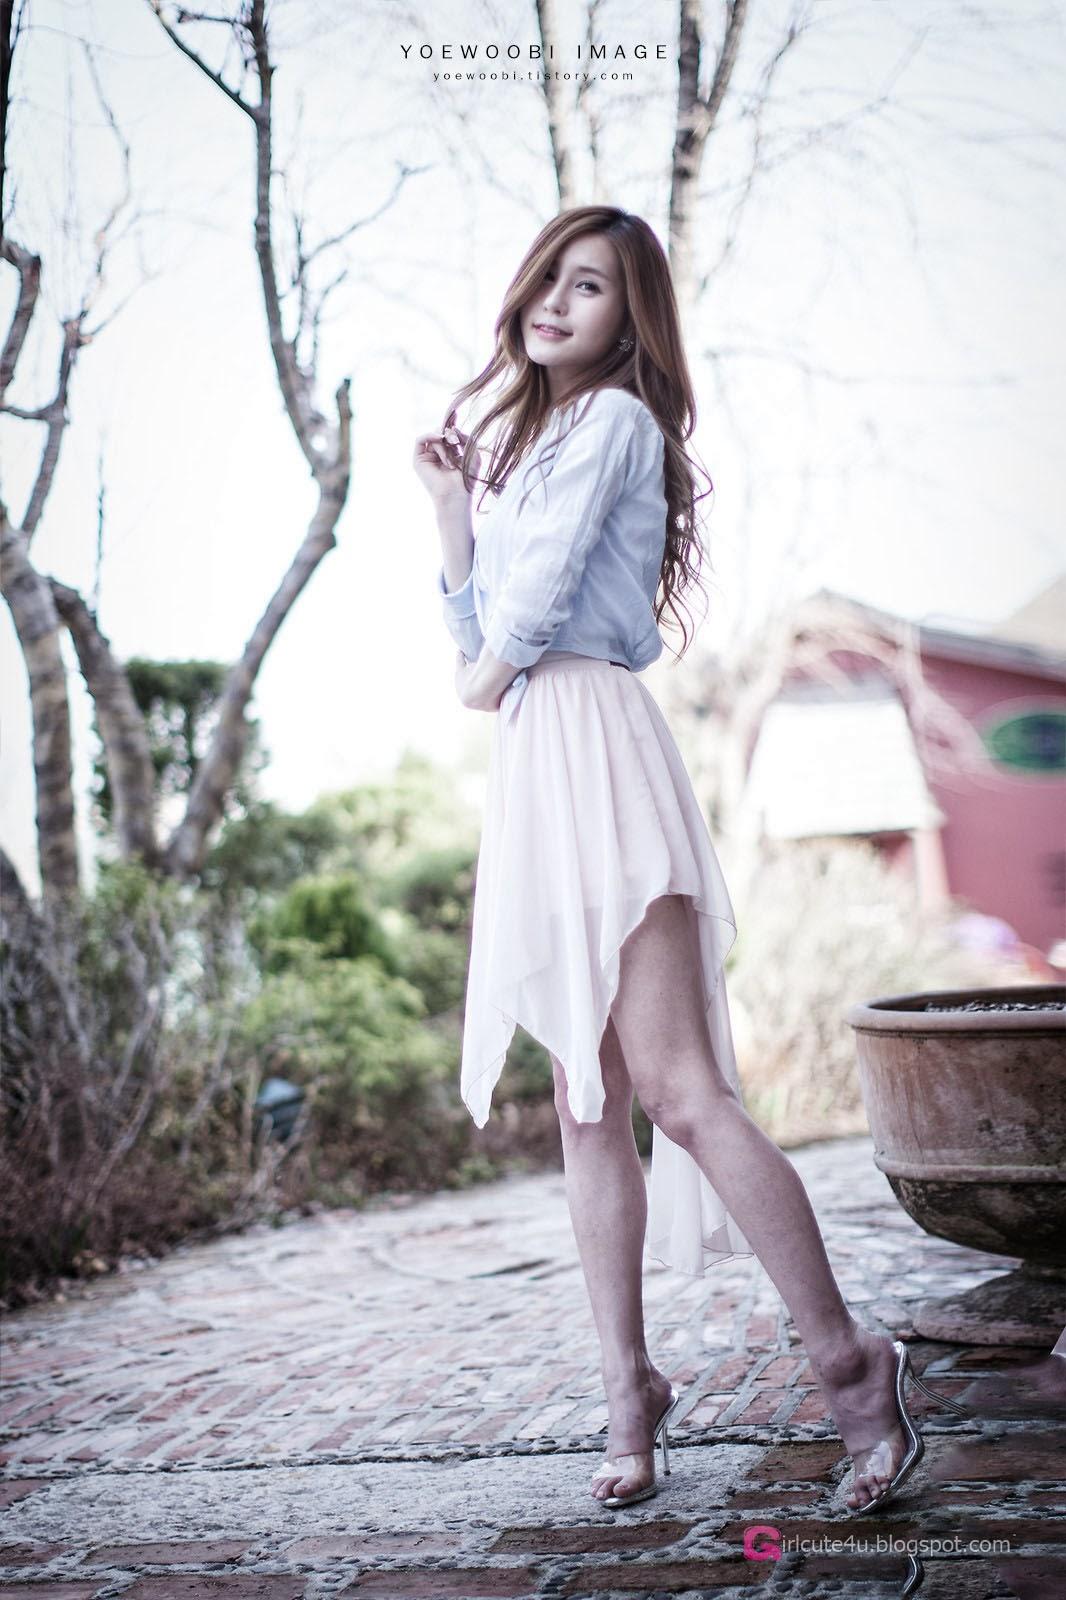 1 Lovely Soo Yu - very cute asian girl-girlcute4u.blogspot.com